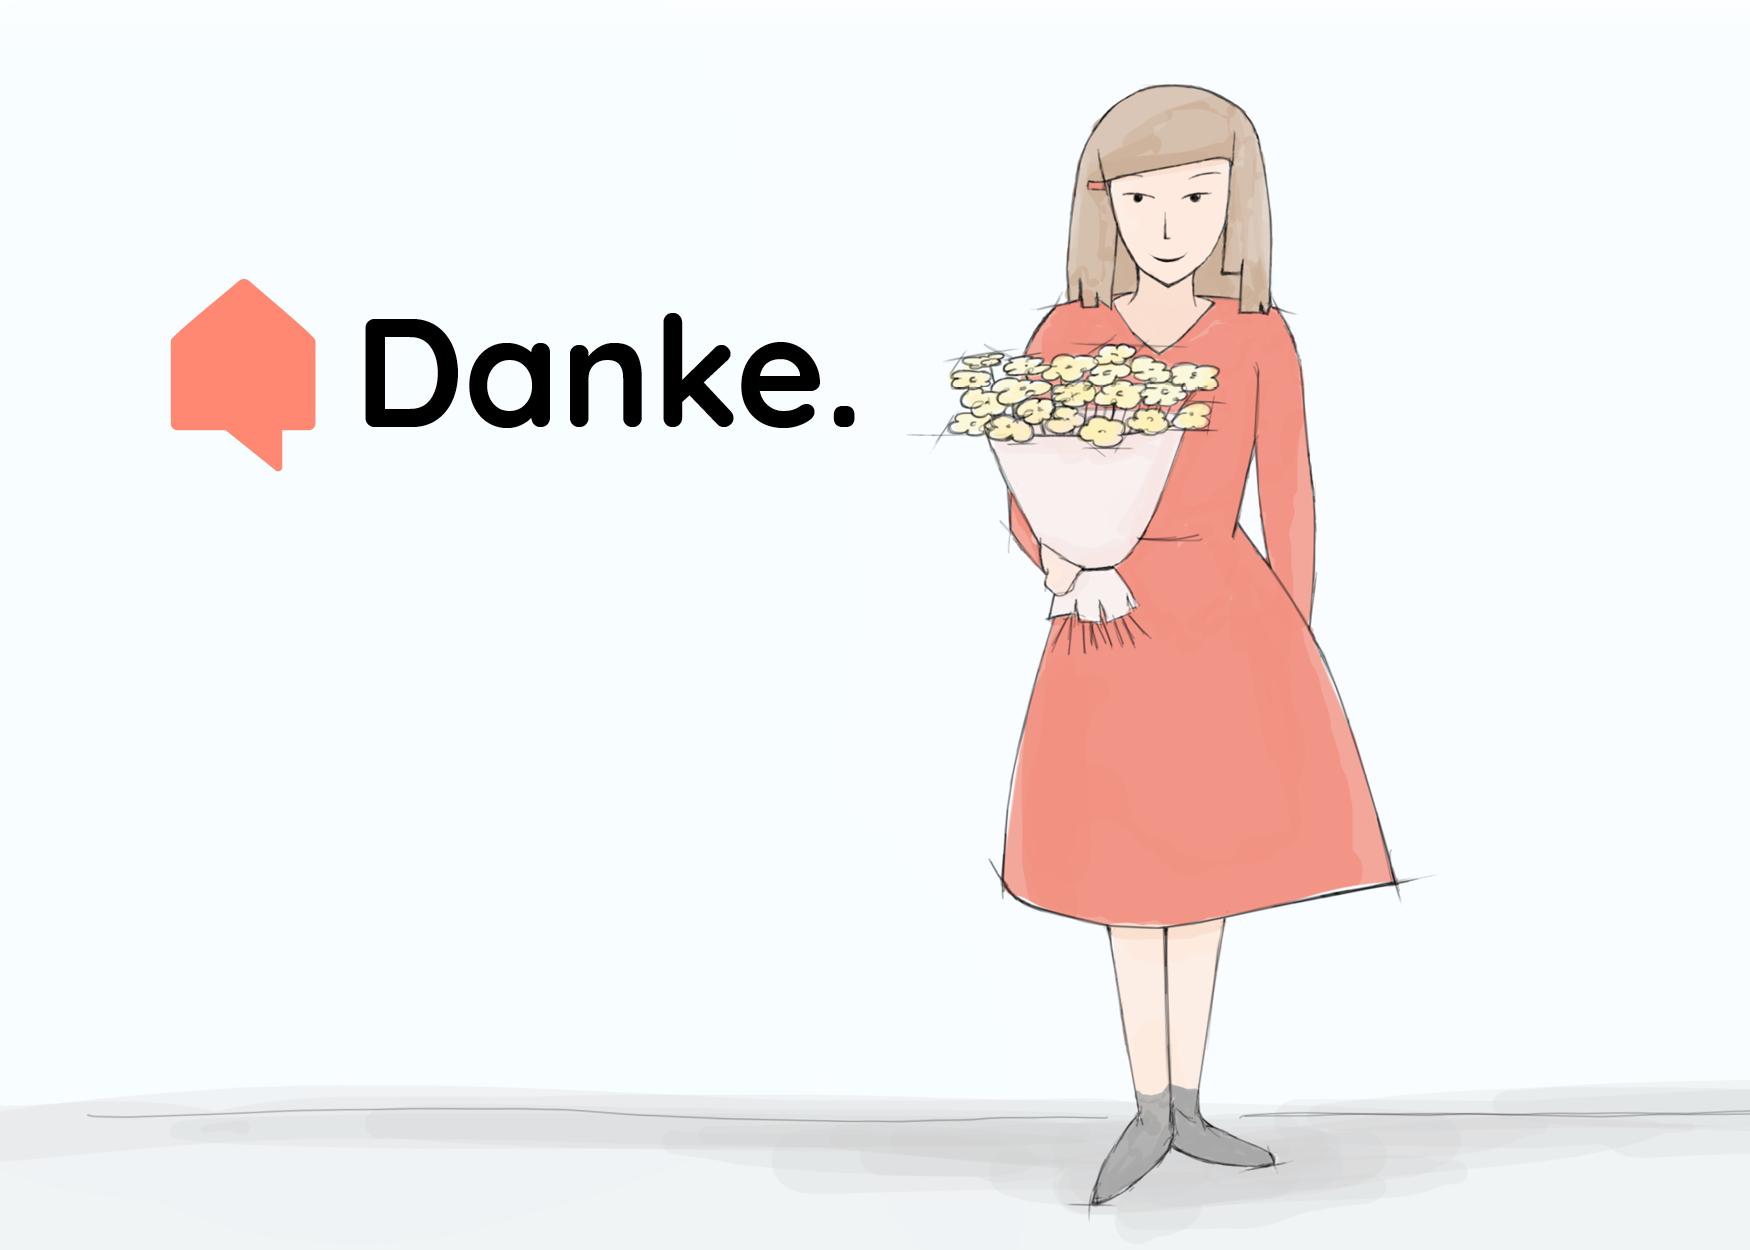 Skizze: Junge Frau haelt dir einen bunten Blumenstrauss entgegen